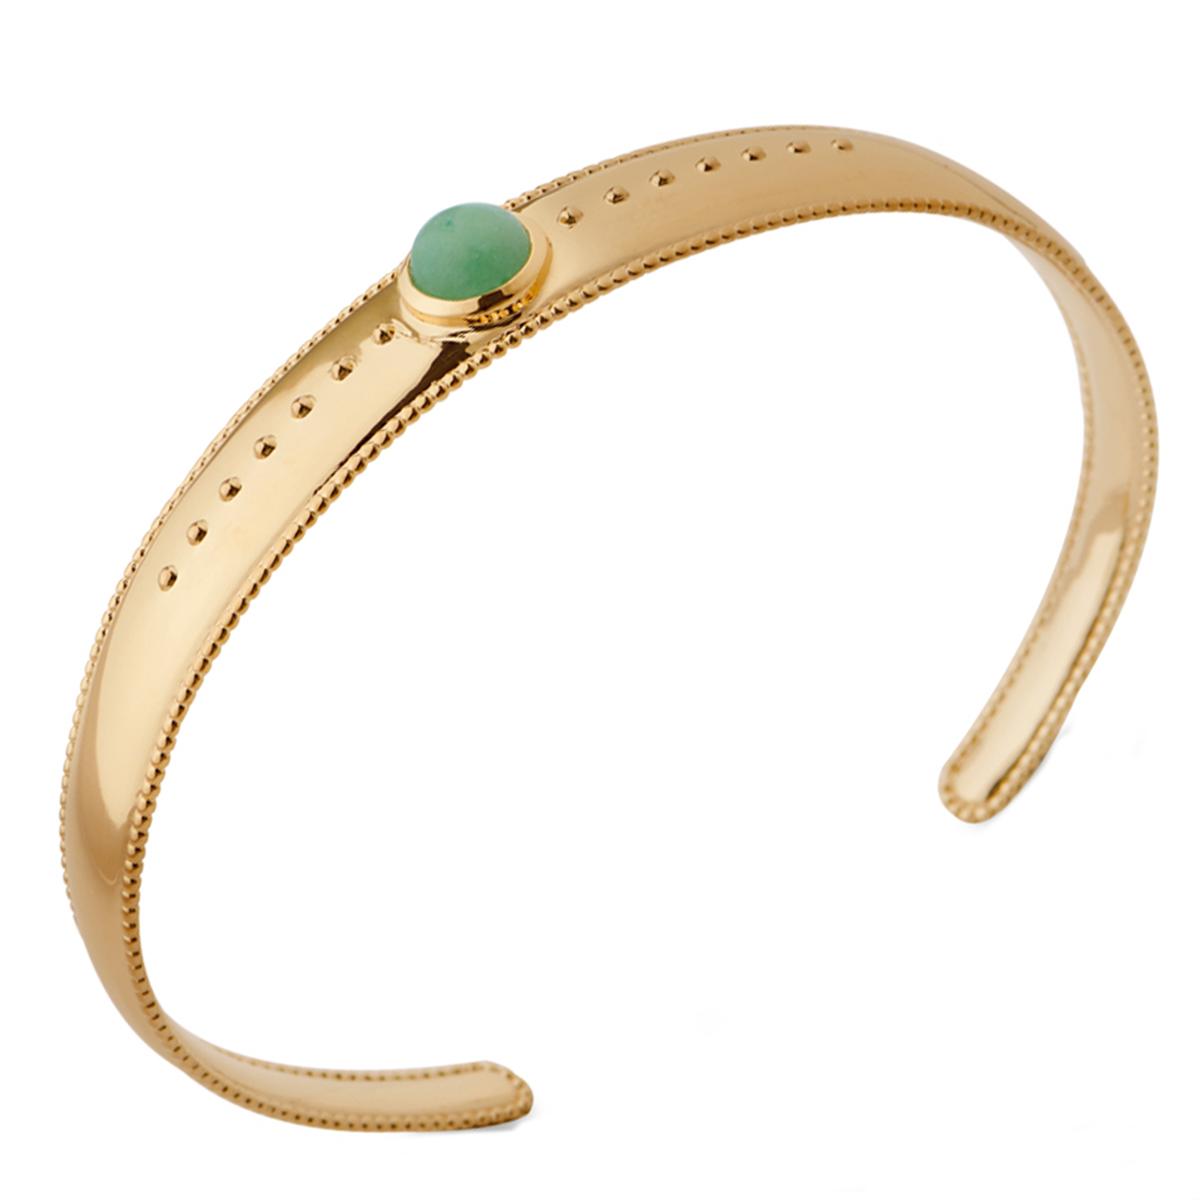 Bracelet Plaqué Or \'Cleopatra\' vert aventurine doré - 7x7 mm - [Q3688]